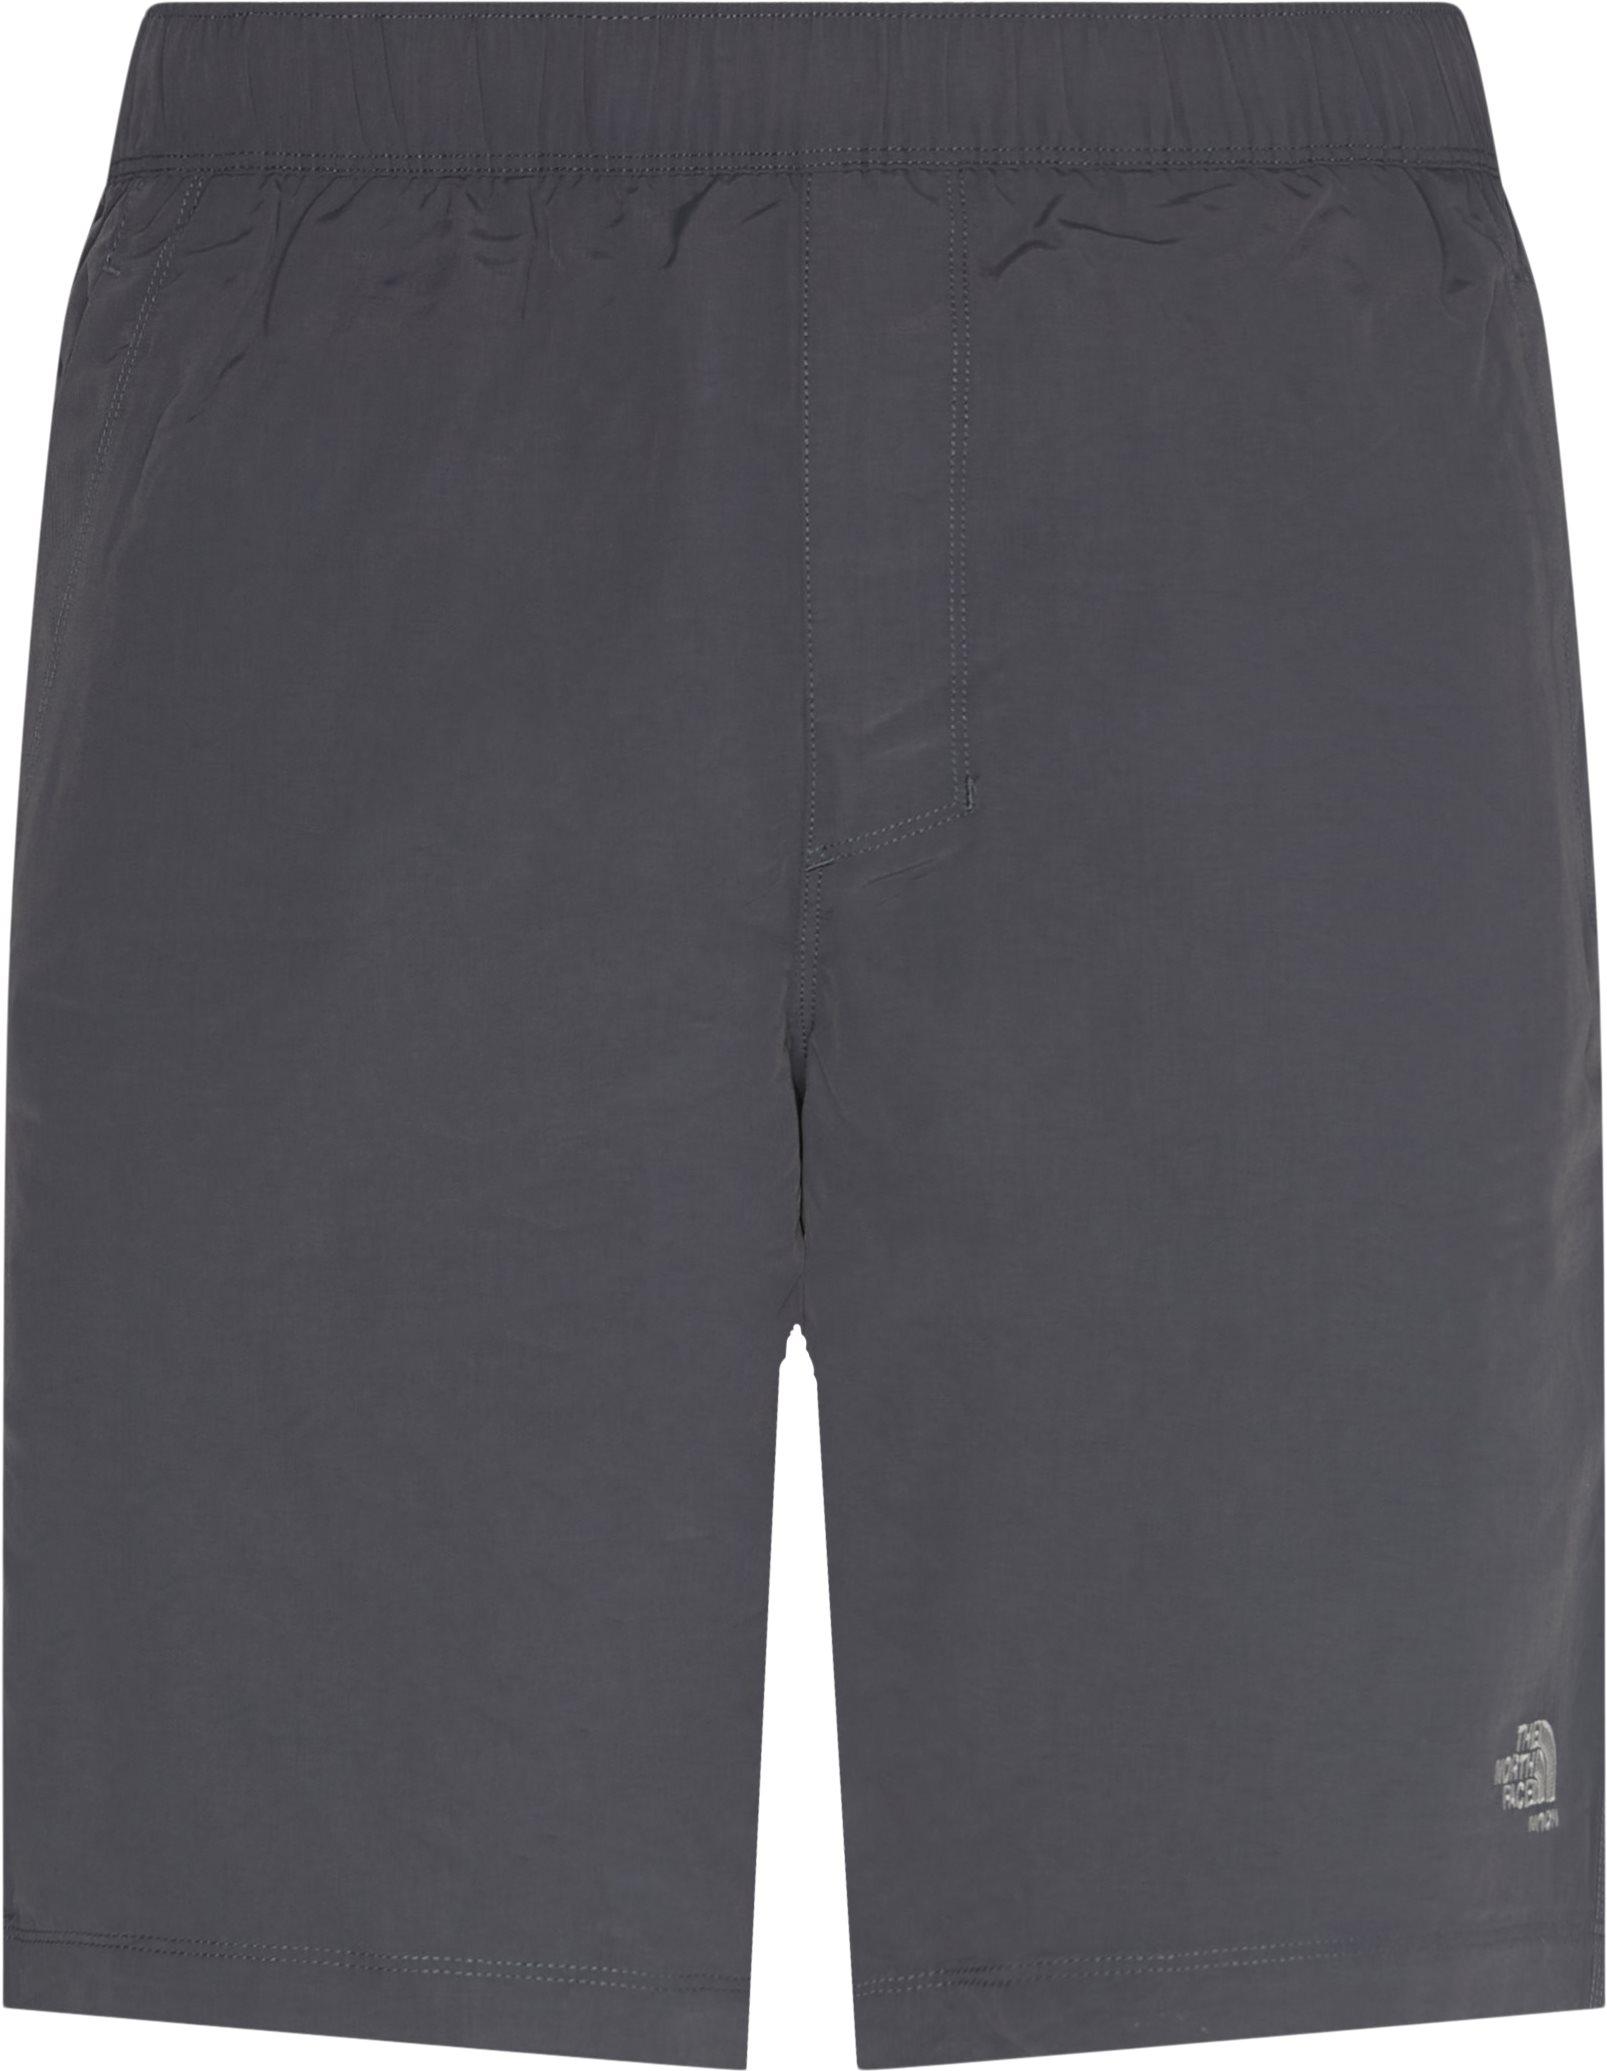 Class V Water shorts - Shorts - Regular fit - Grå